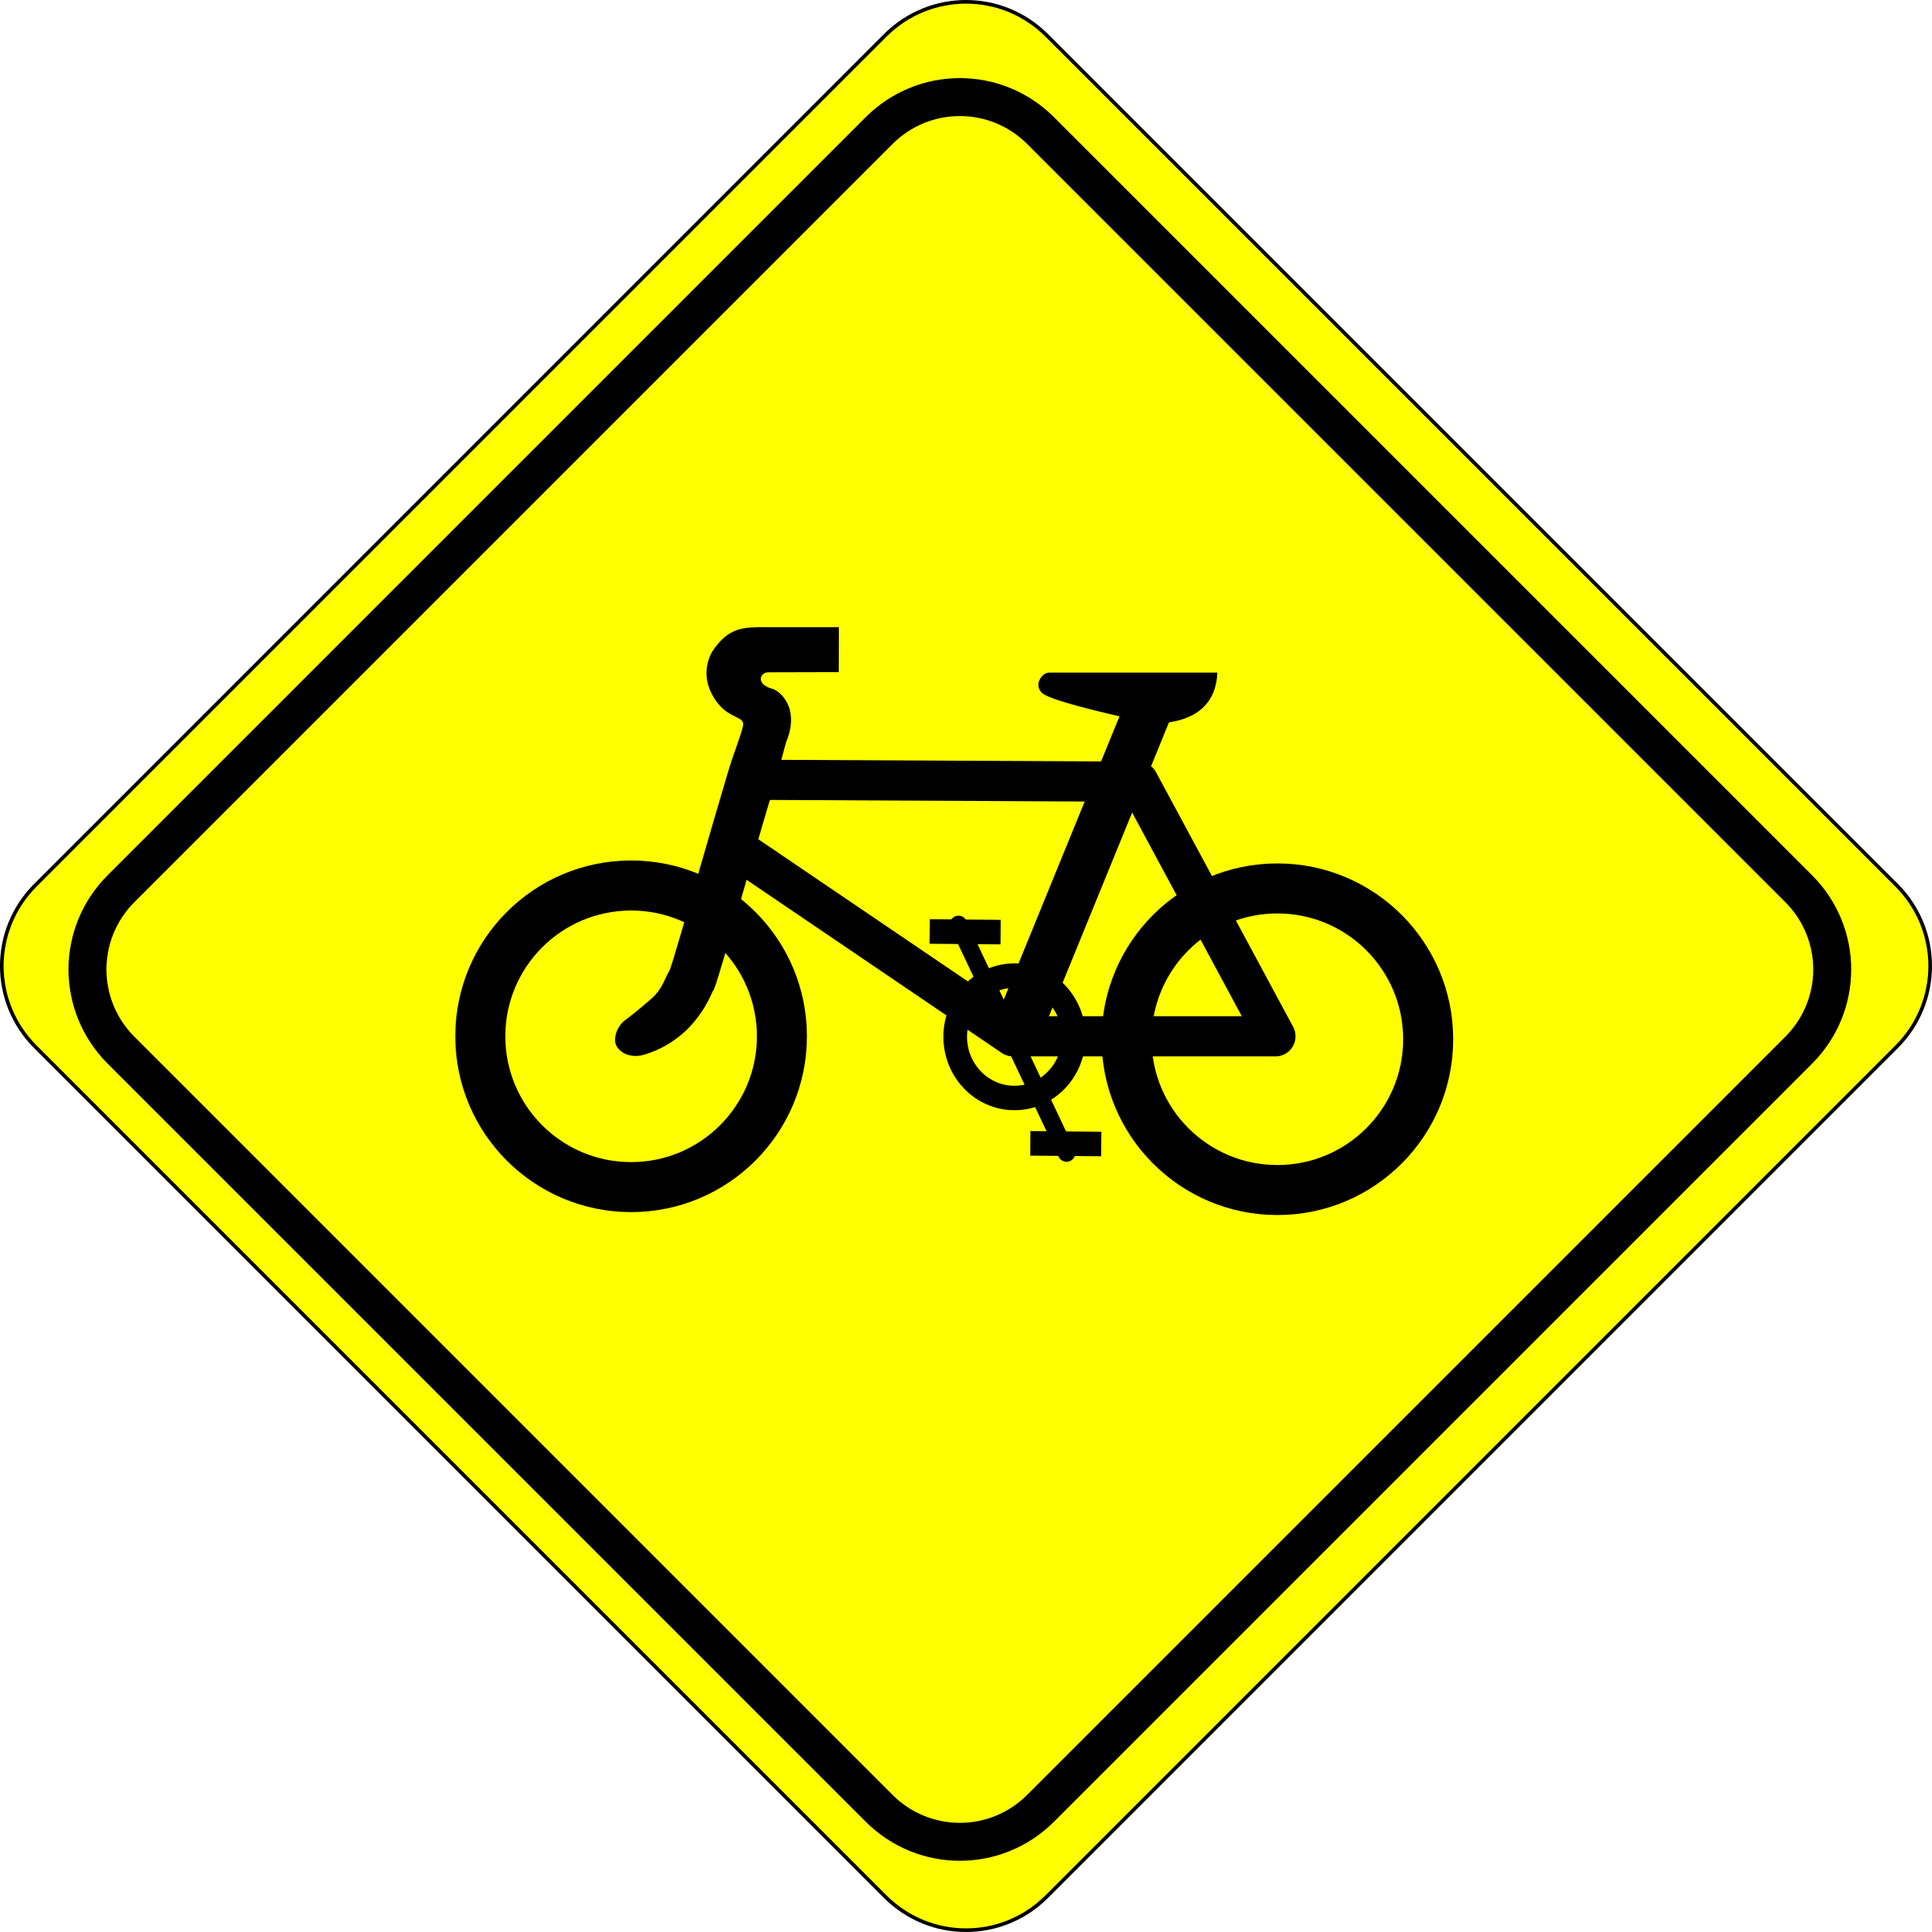 Clipart bike yellow bike. Roadsign watch for bicycles